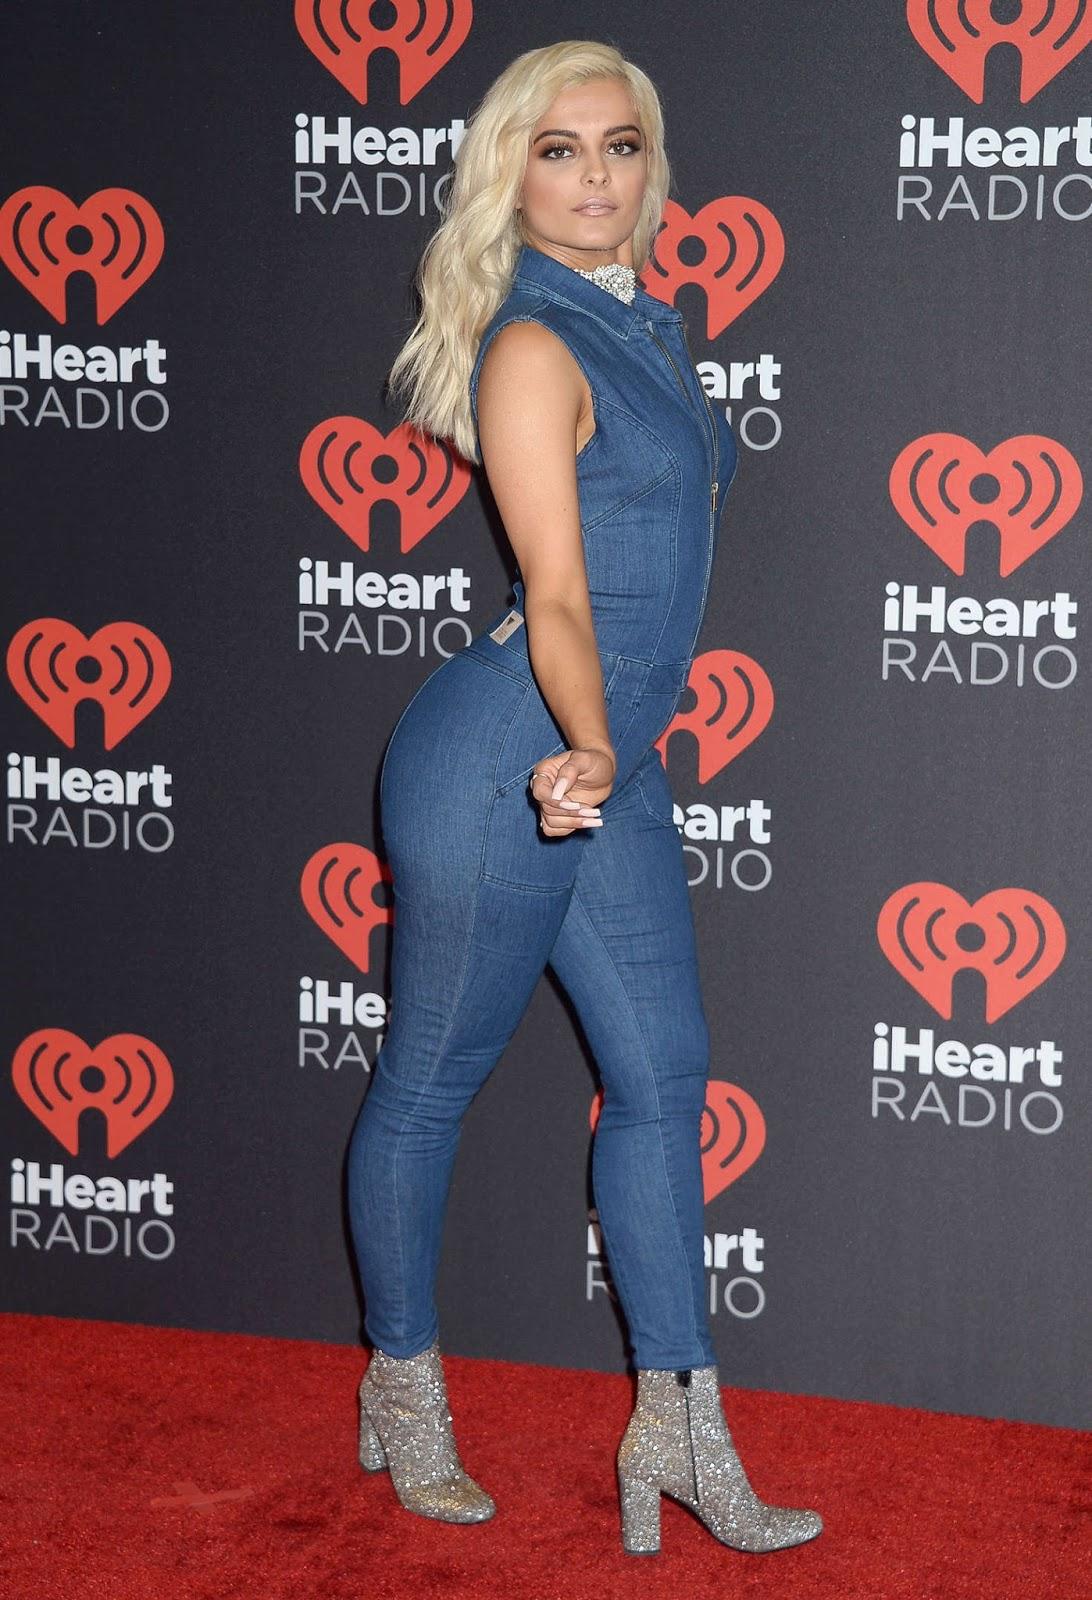 Bebe Rexha Posing at 2016 iHeartRadio Music Festival